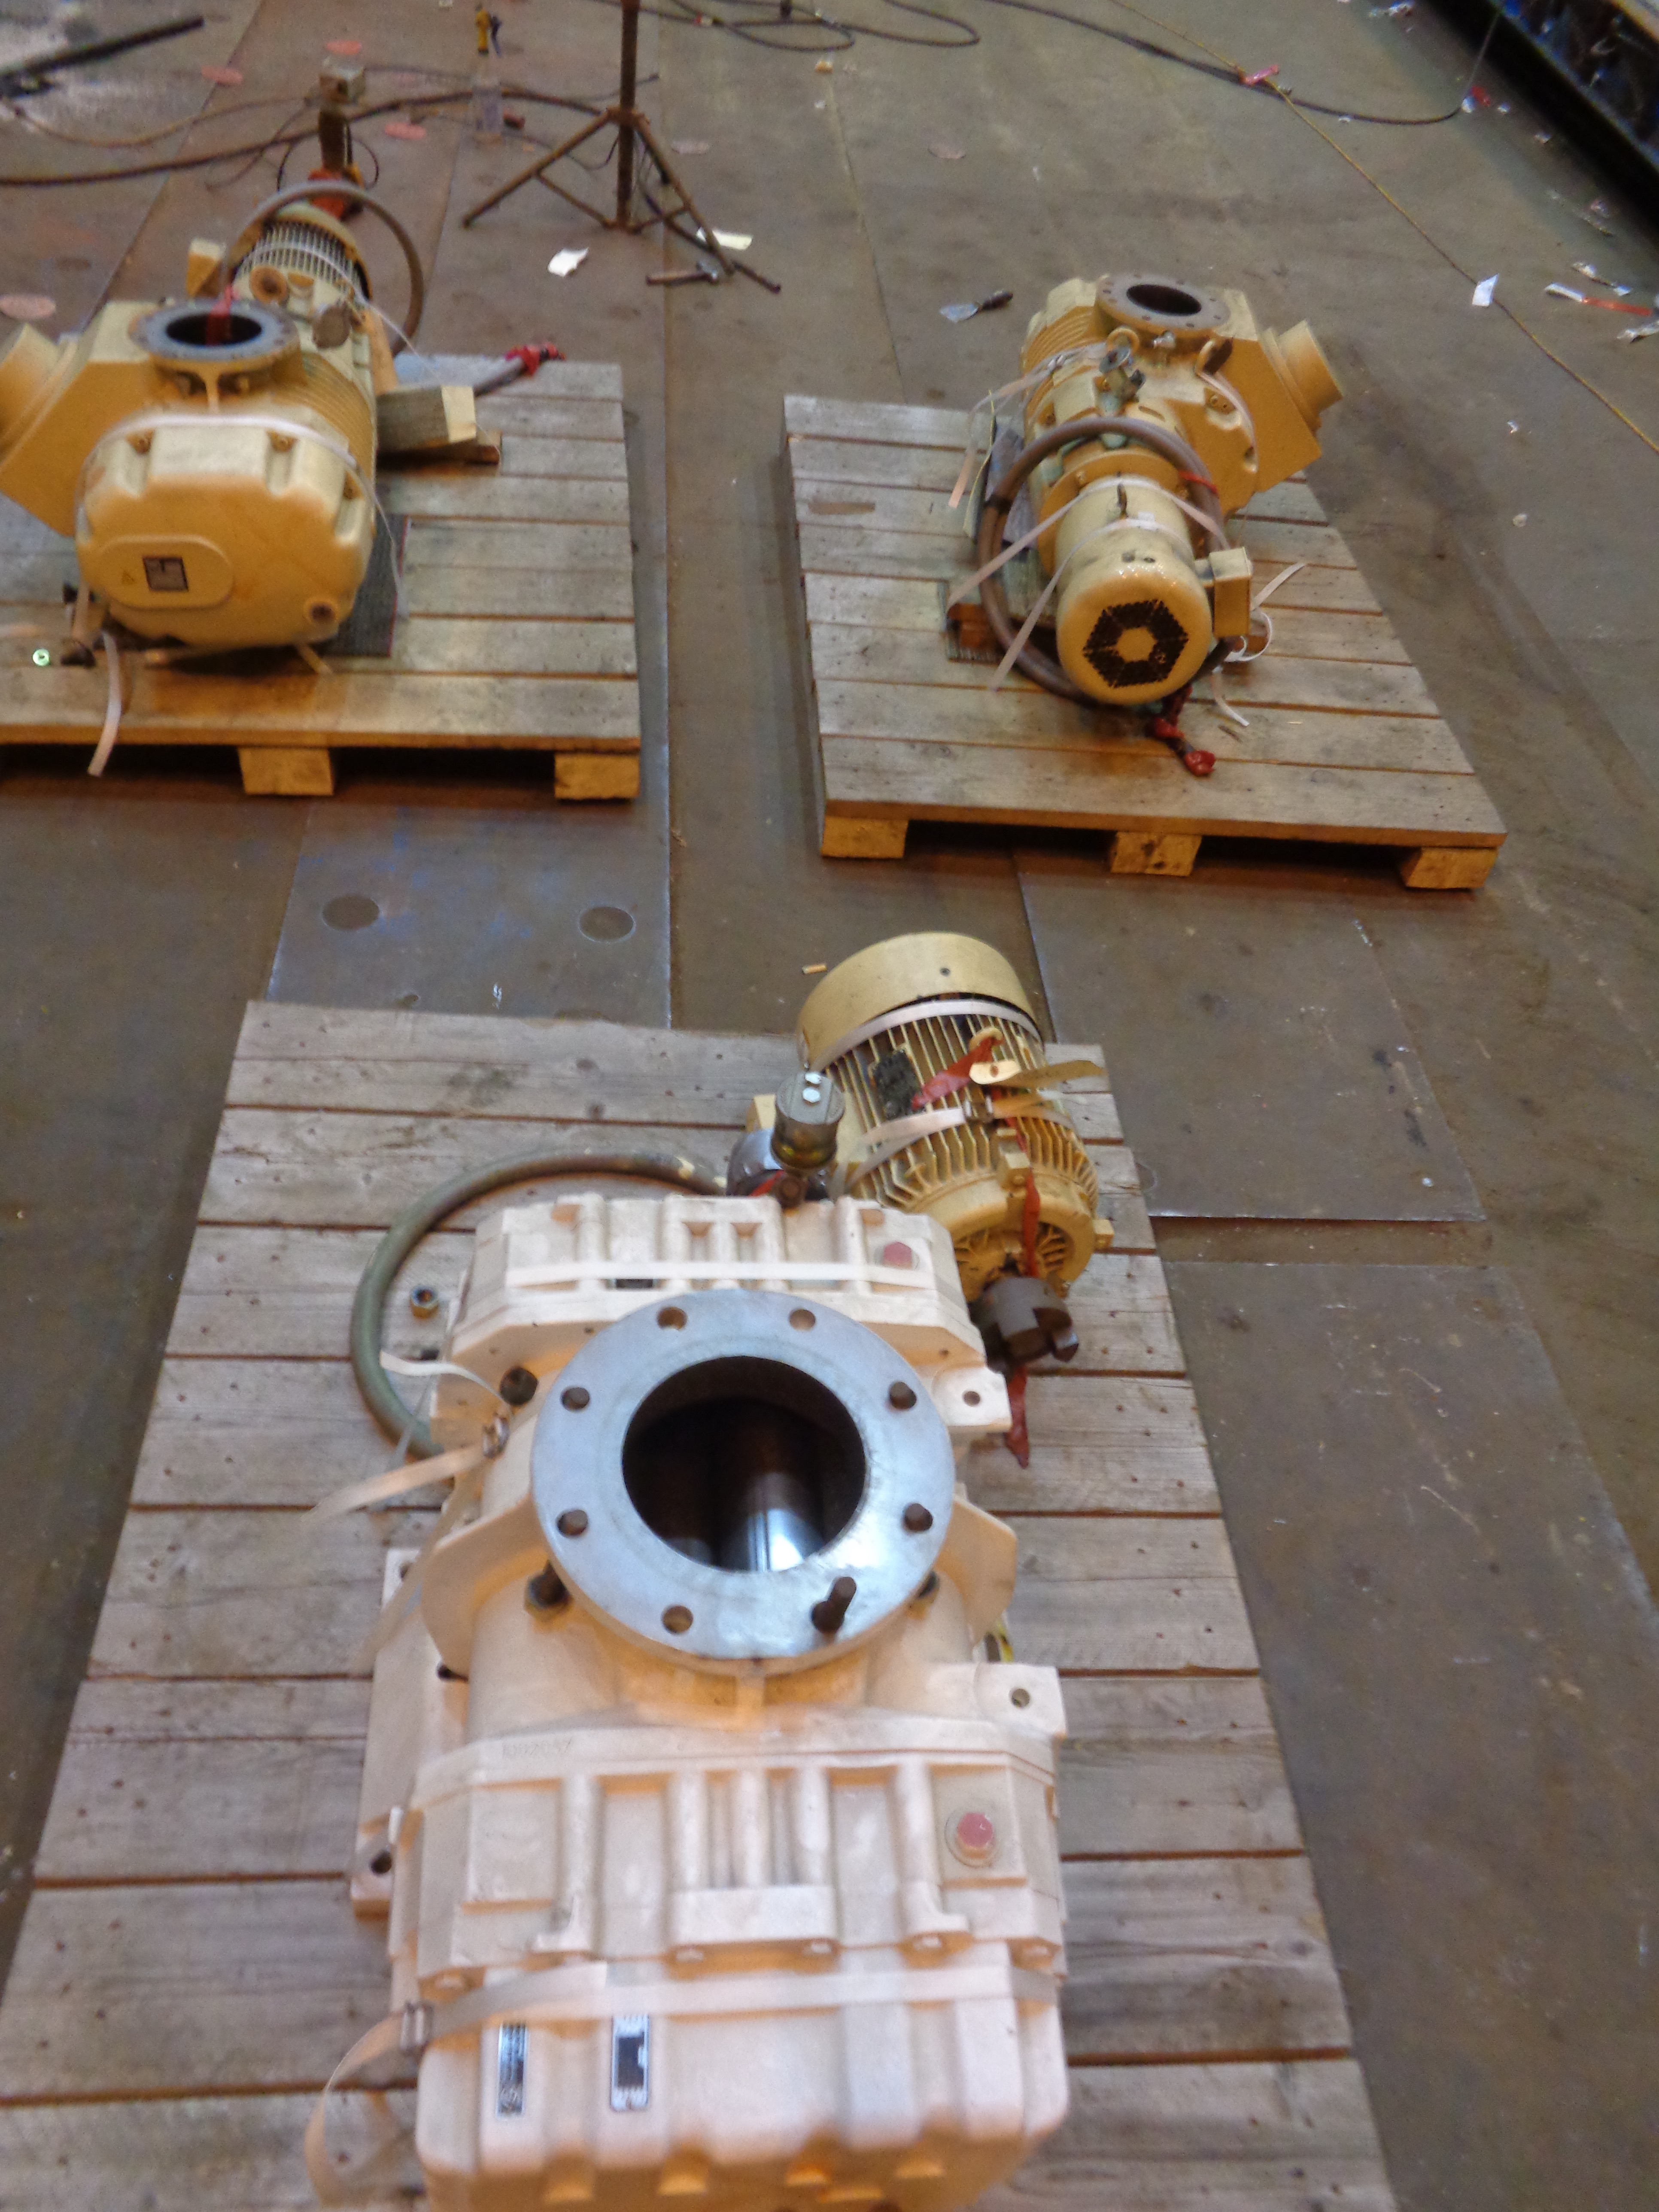 Lot of 3 Vacuum Pumps - Image 10 of 26